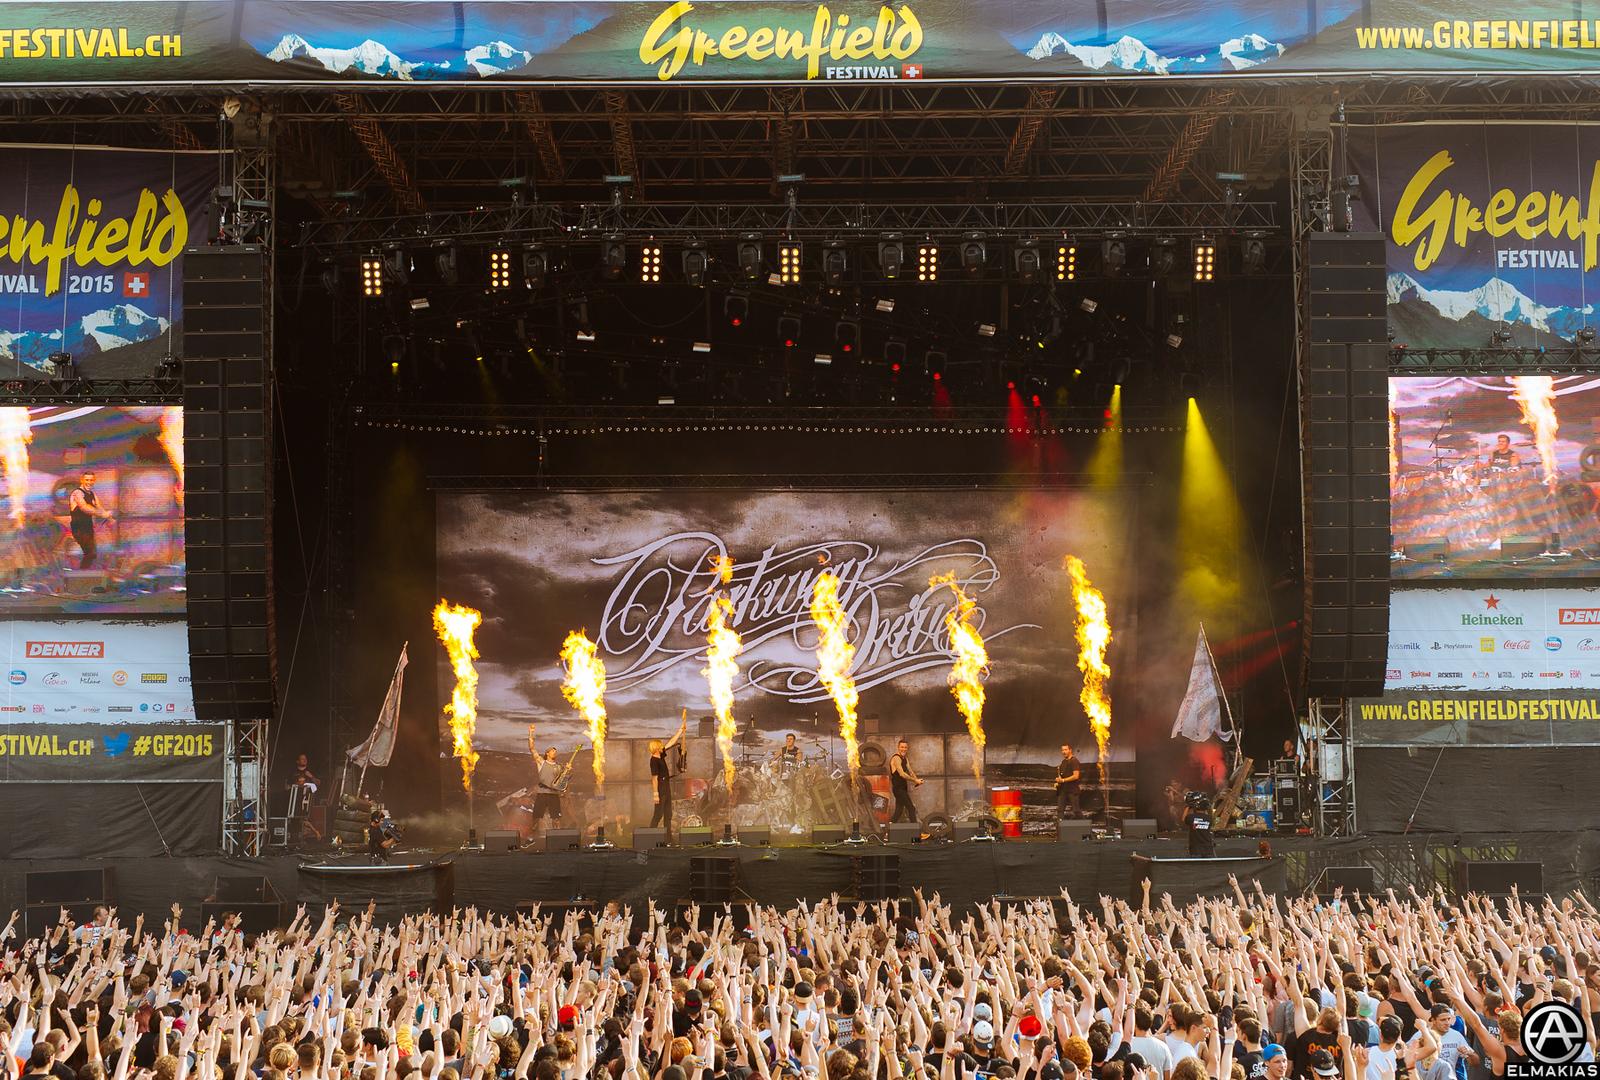 Parkway Drive live at Greenfield Festival in Interlaken, Switzerland - European Festivals